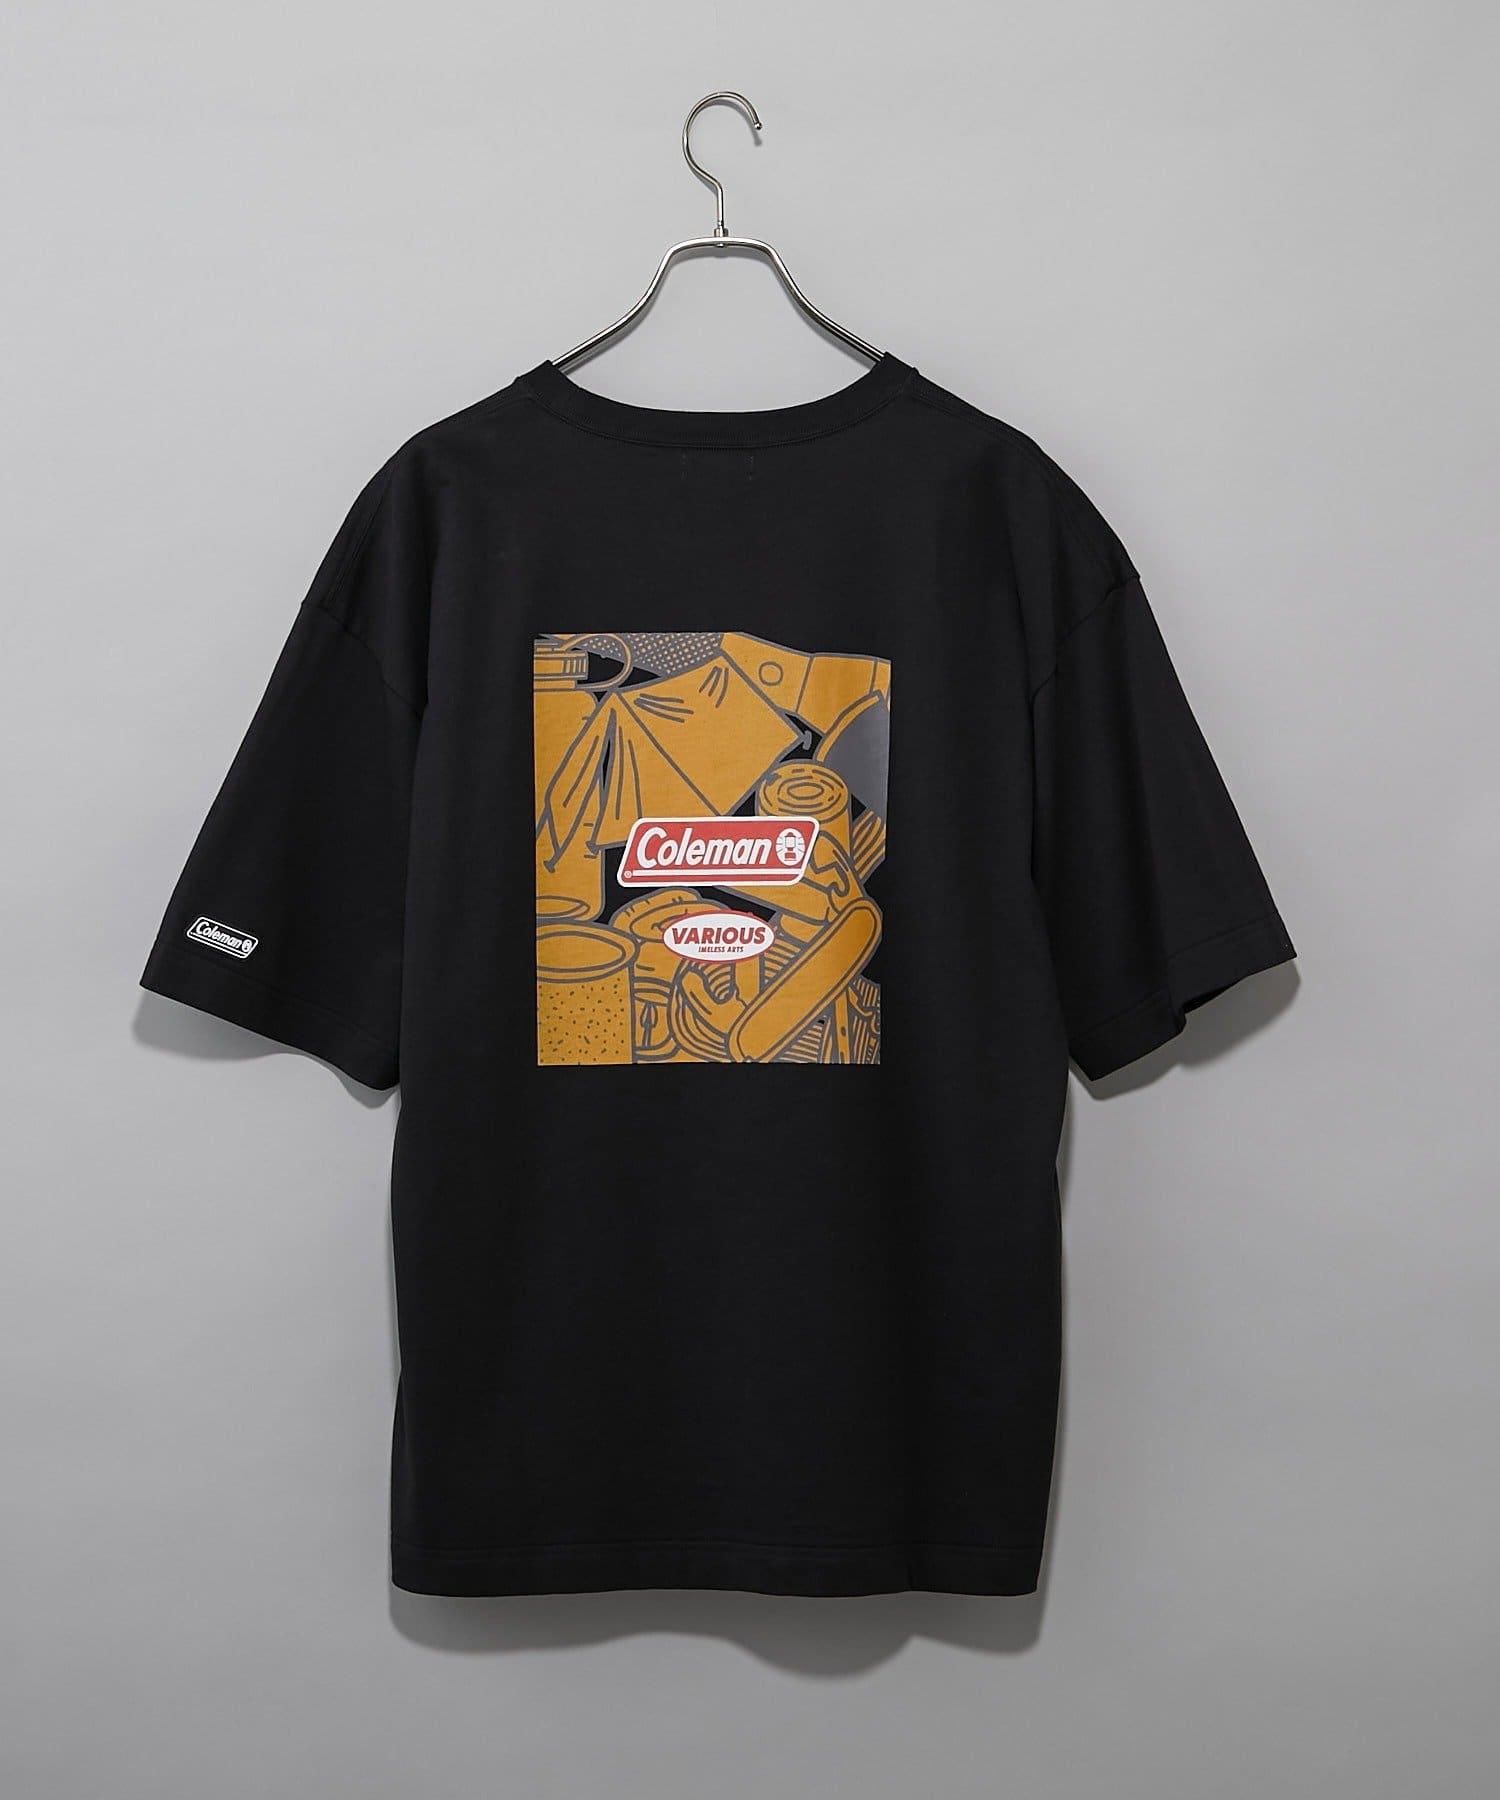 CIAOPANIC(チャオパニック) 【Coleman×CIAOPANIC】CAMP バックプリントロゴTシャツ